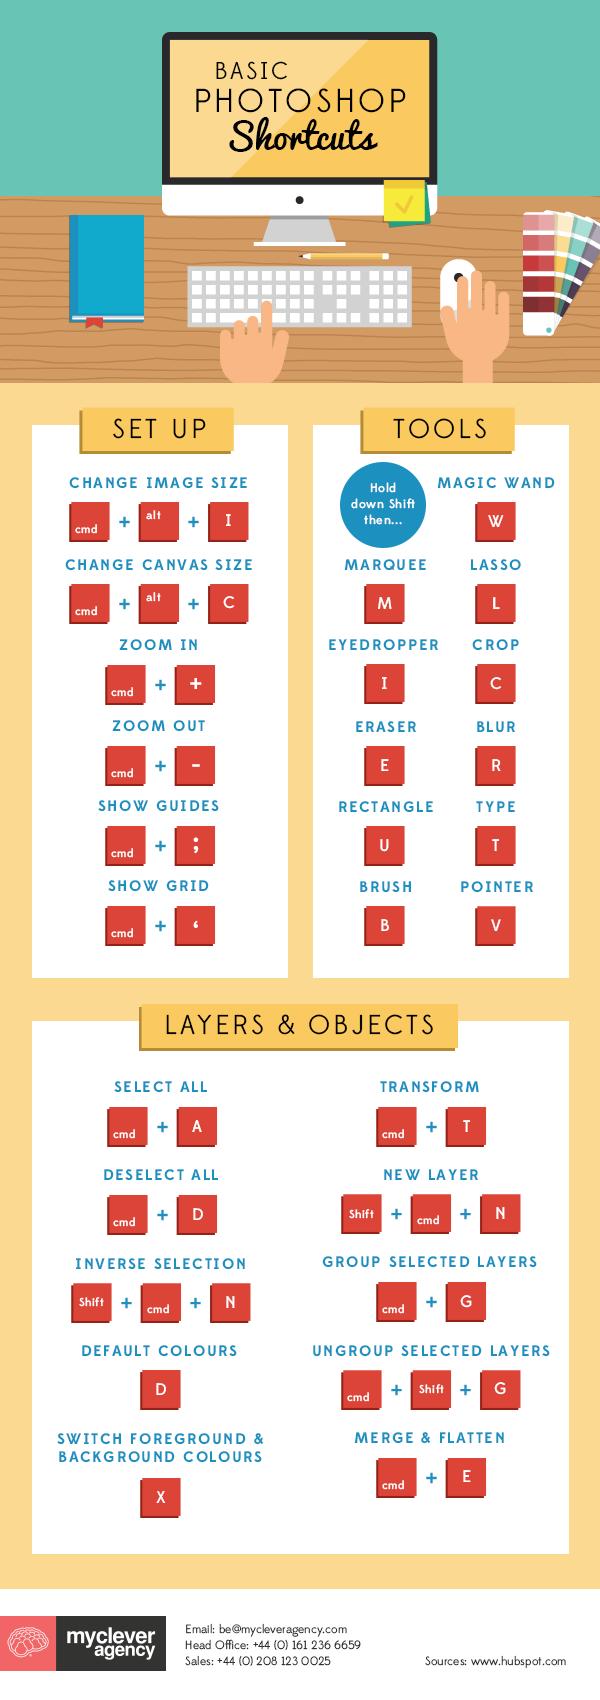 Basic #Photoshop Shortcuts #infographic